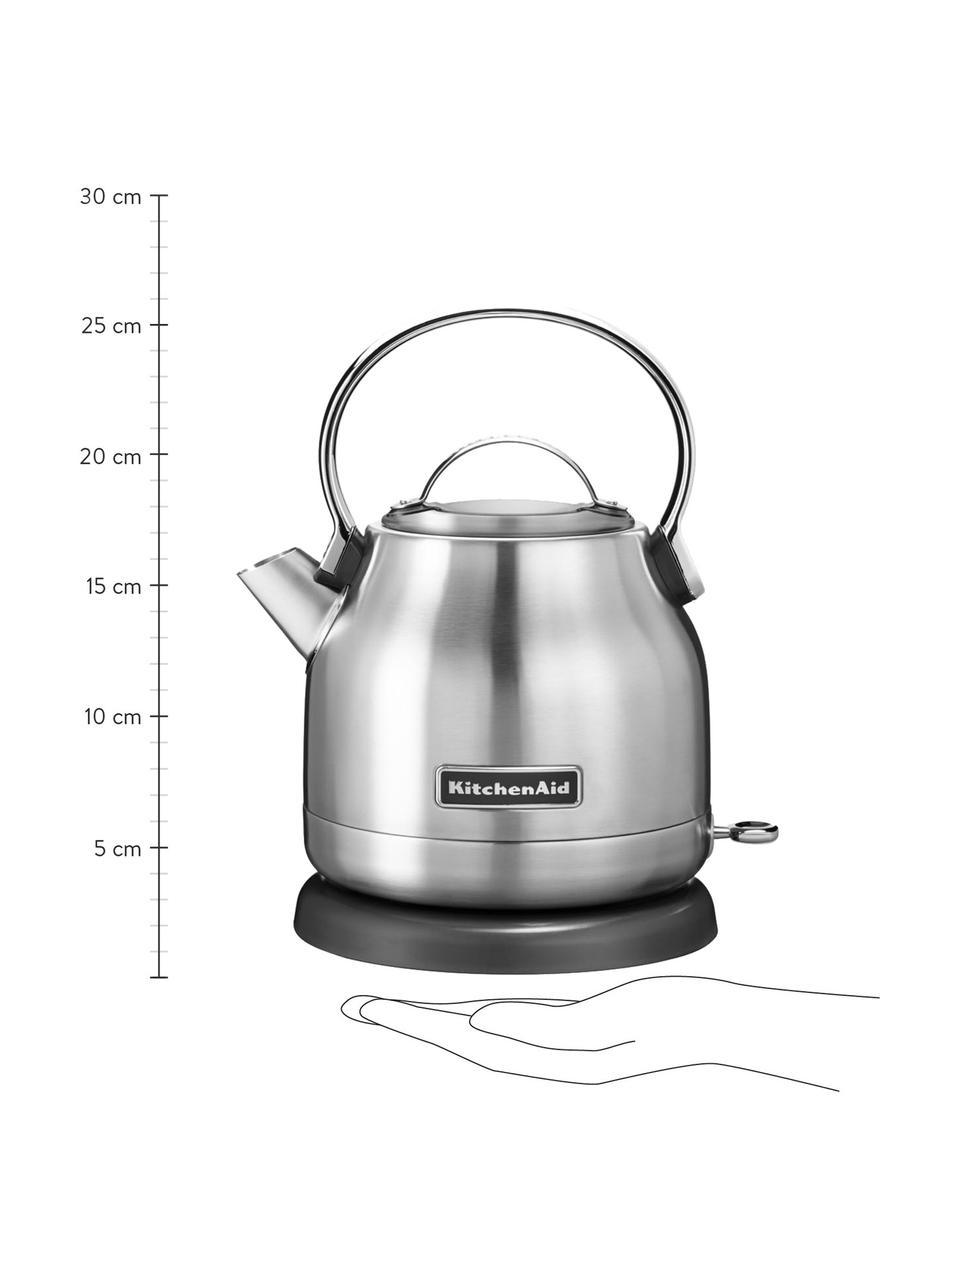 Wasserkocher KitchenAid, Edelstahl, Edelstahl, 23 x 18 cm